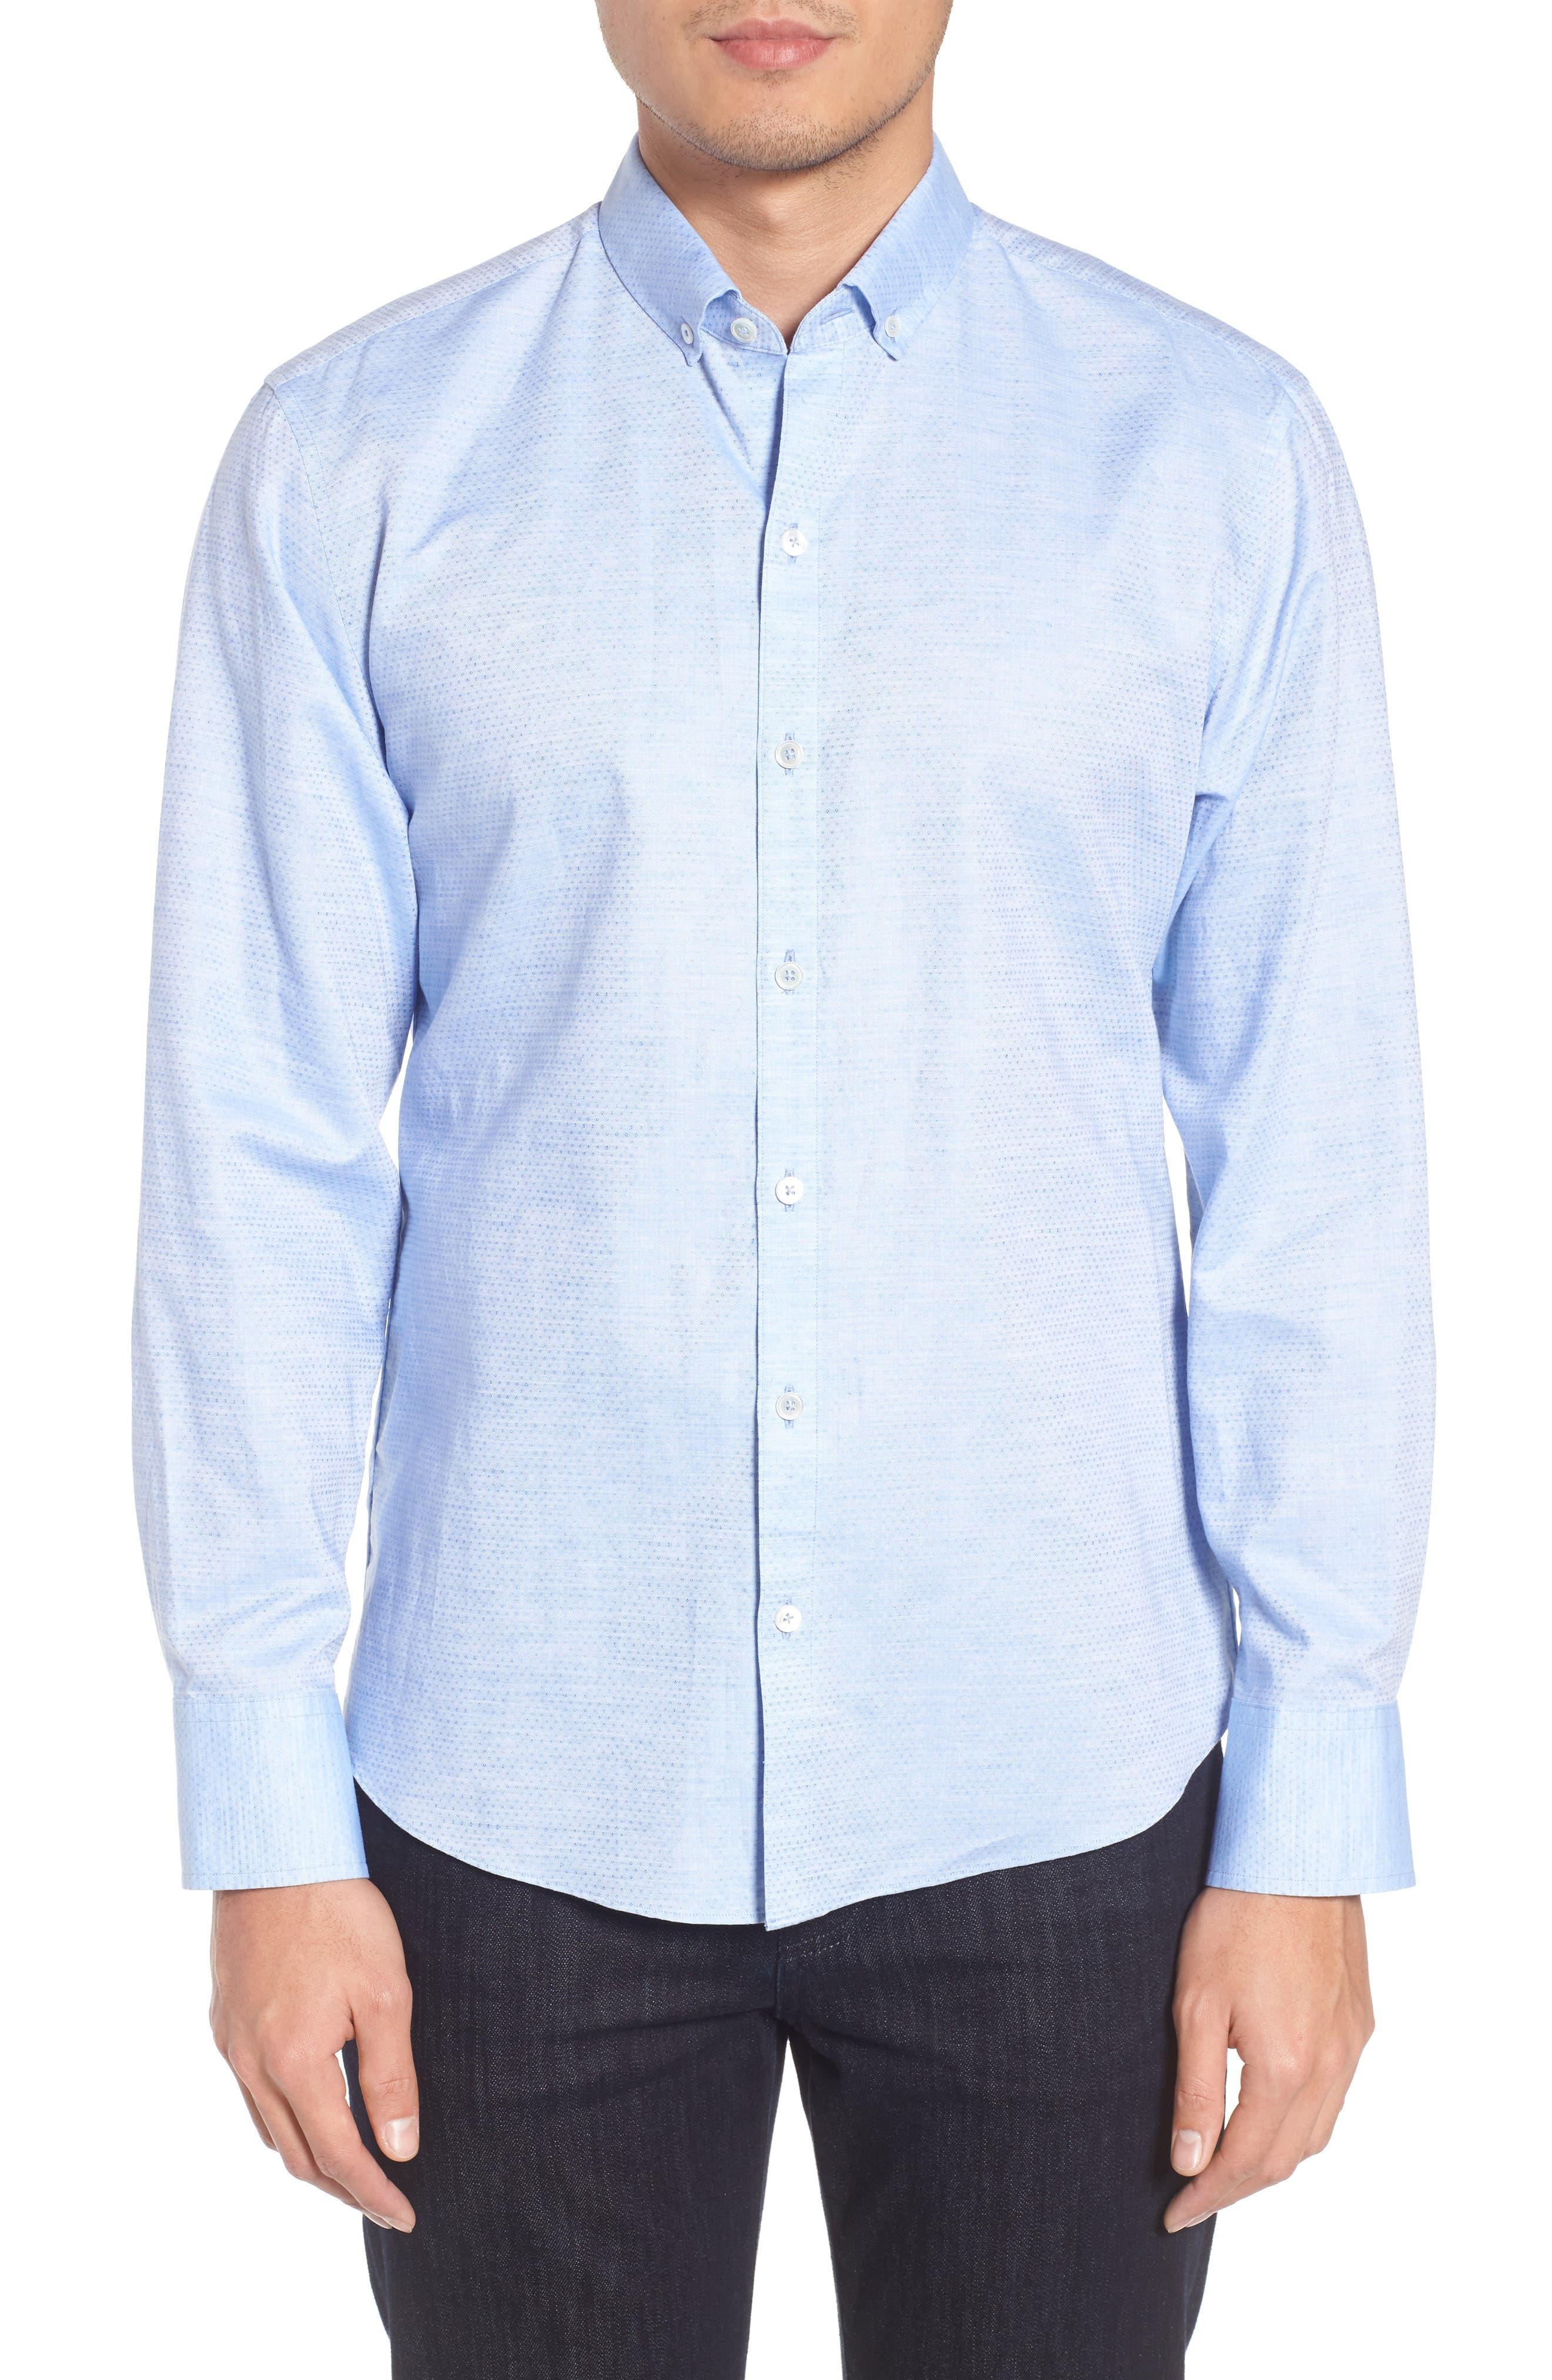 Gomis Regular Fit Dobby Sport Shirt,                         Main,                         color, Light Blue